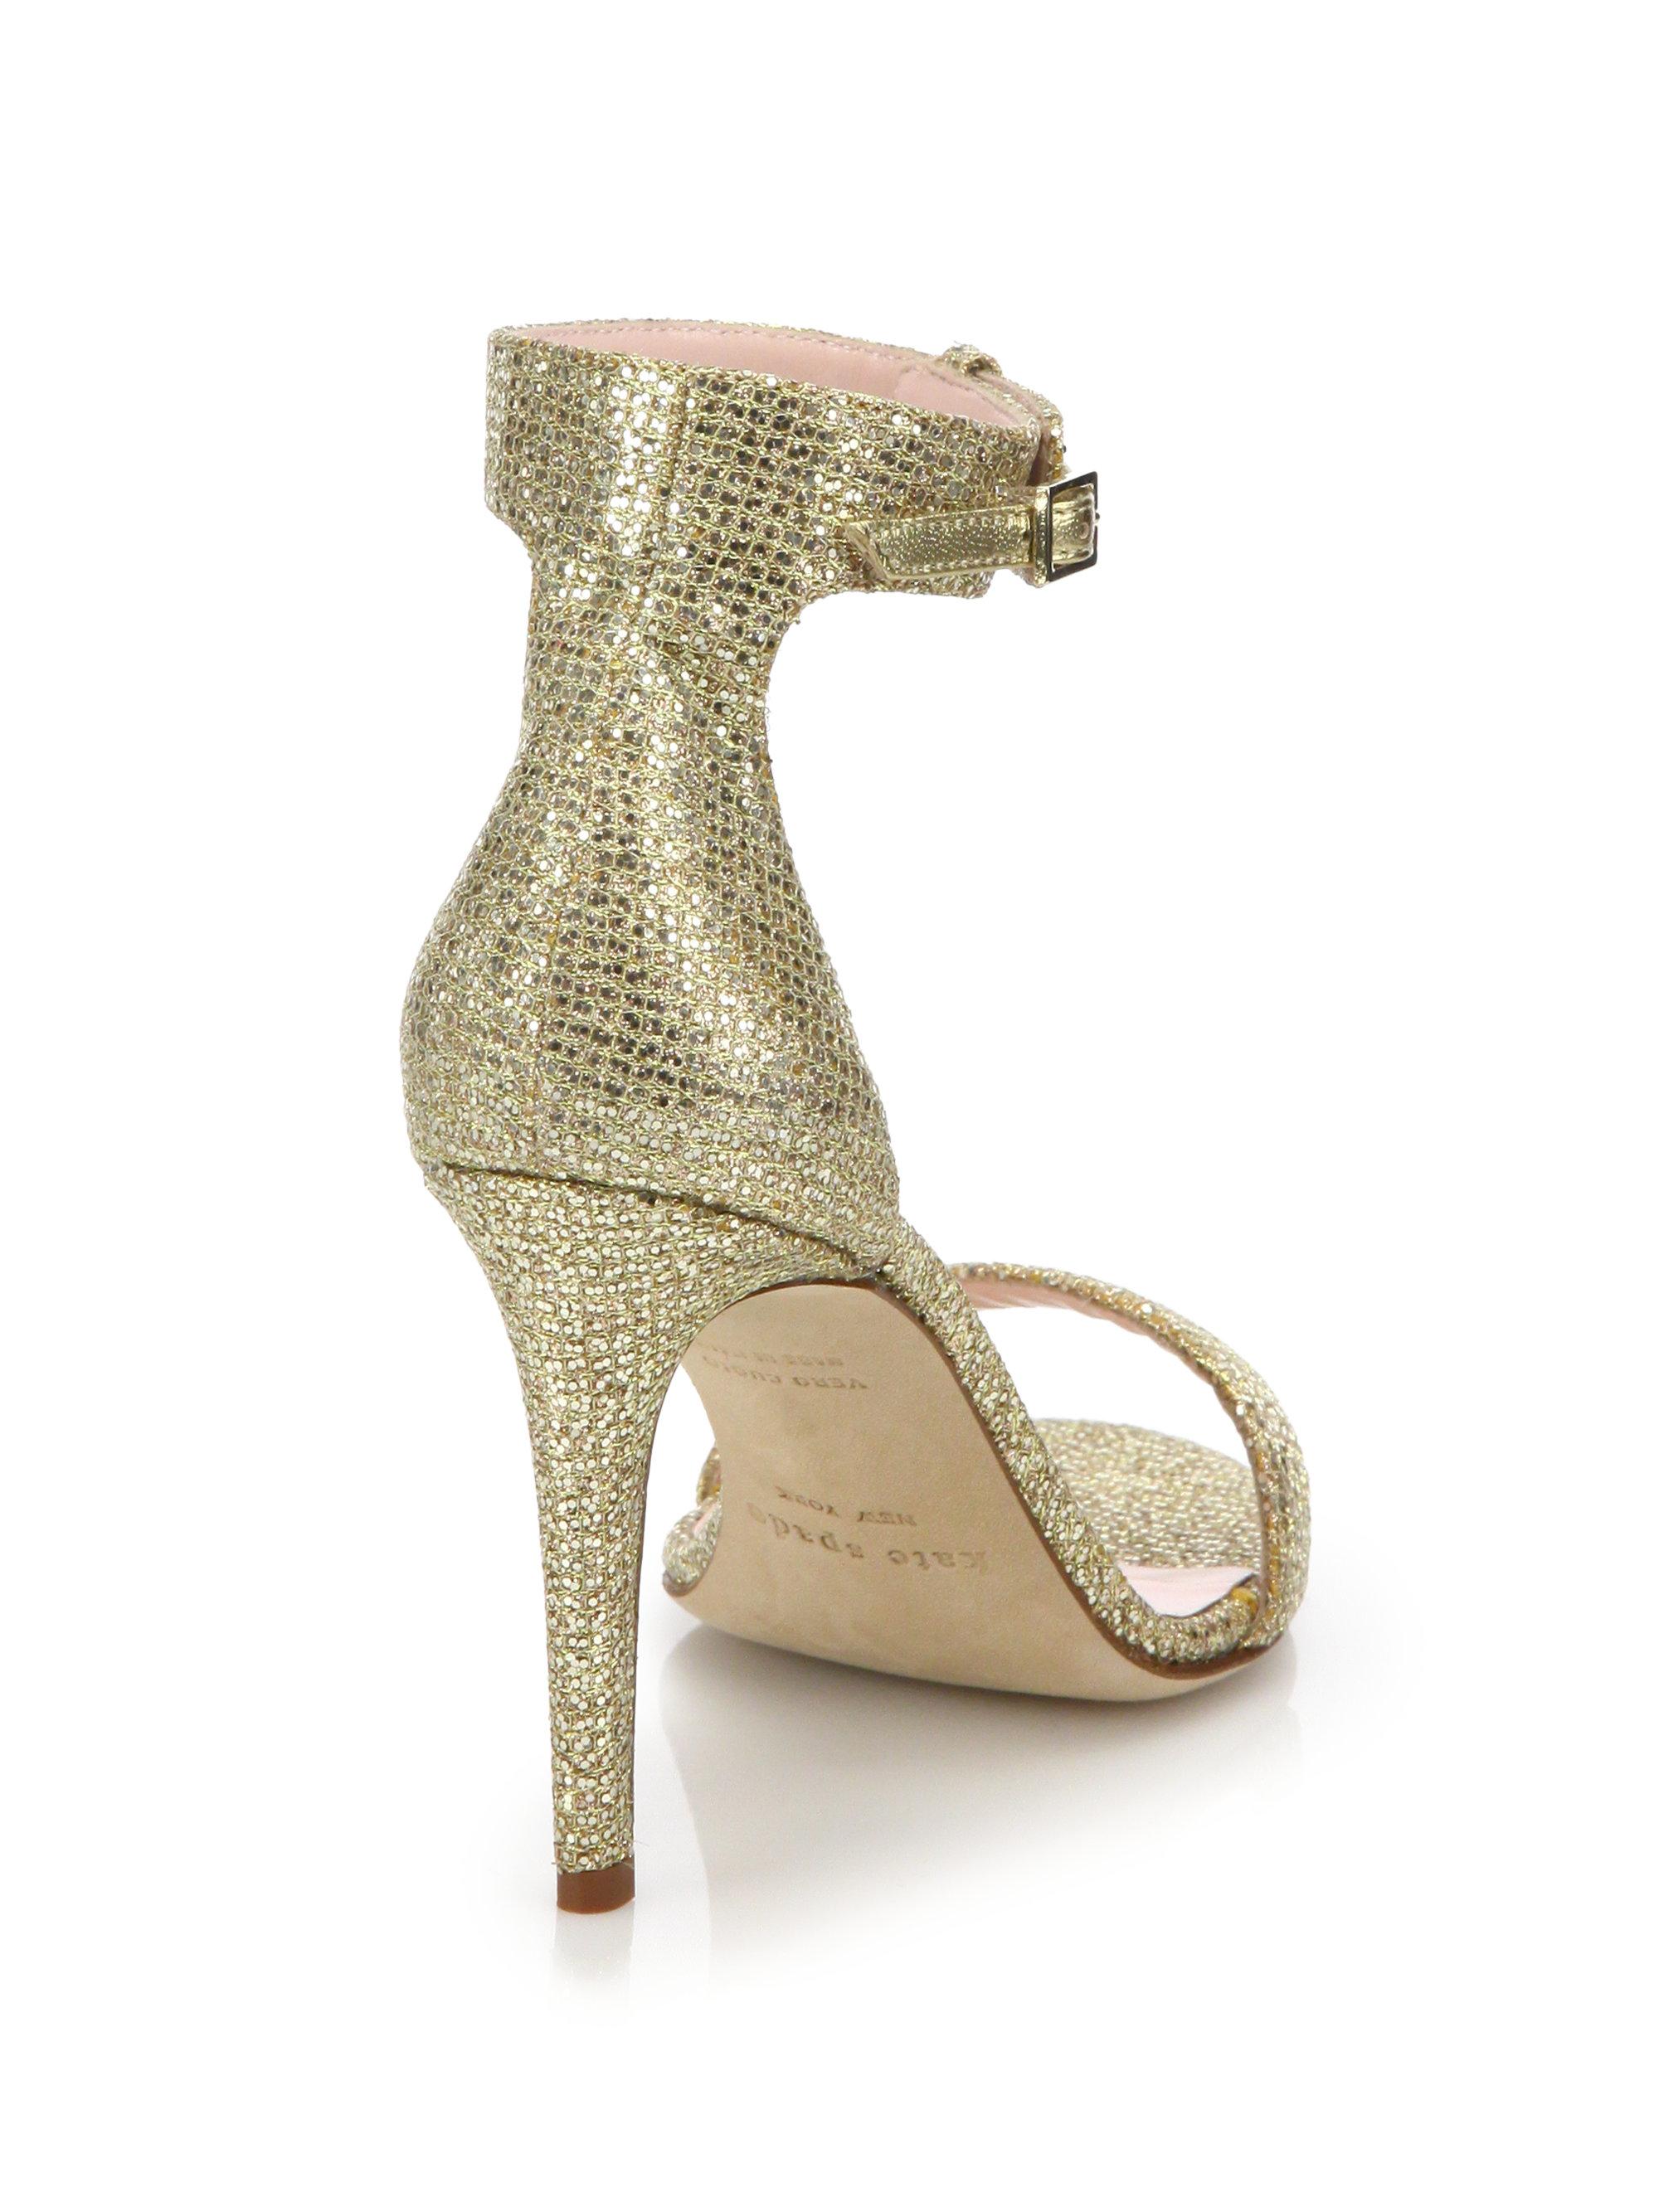 466afca1c29c Lyst - Kate Spade Isa Glitter Lurex Sandals in Metallic